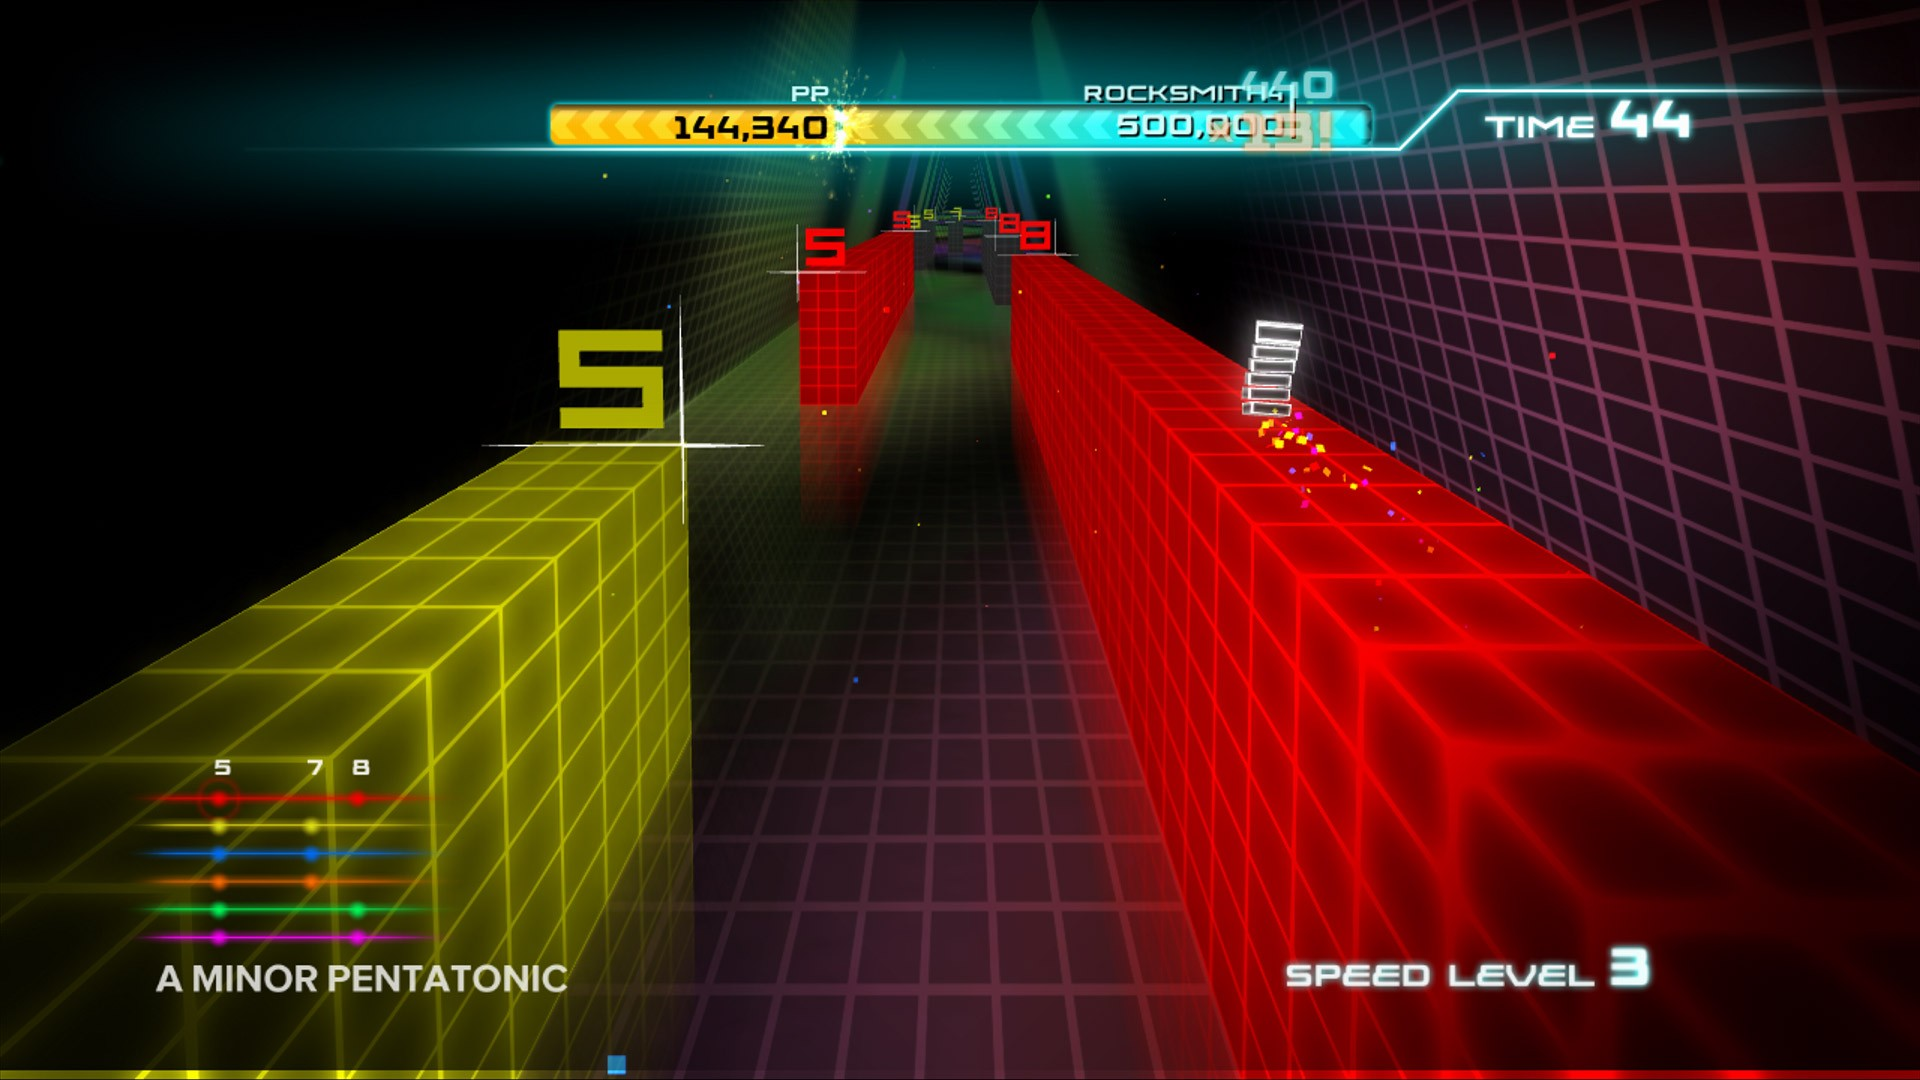 Rocksmith screenshot